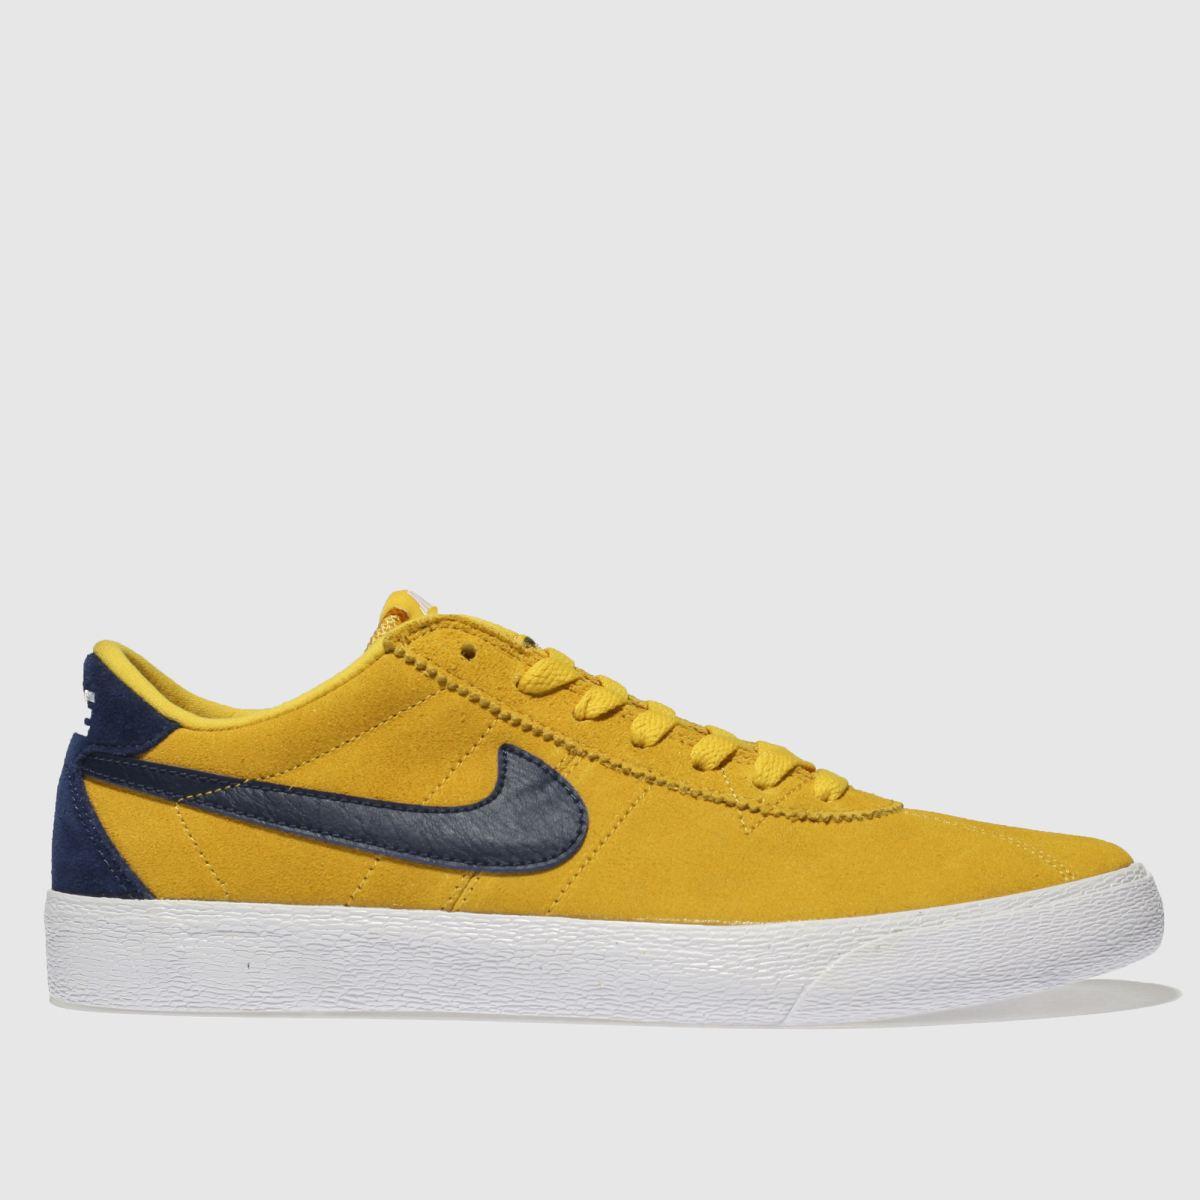 Nike Sb Yellow Bruin Low Trainers